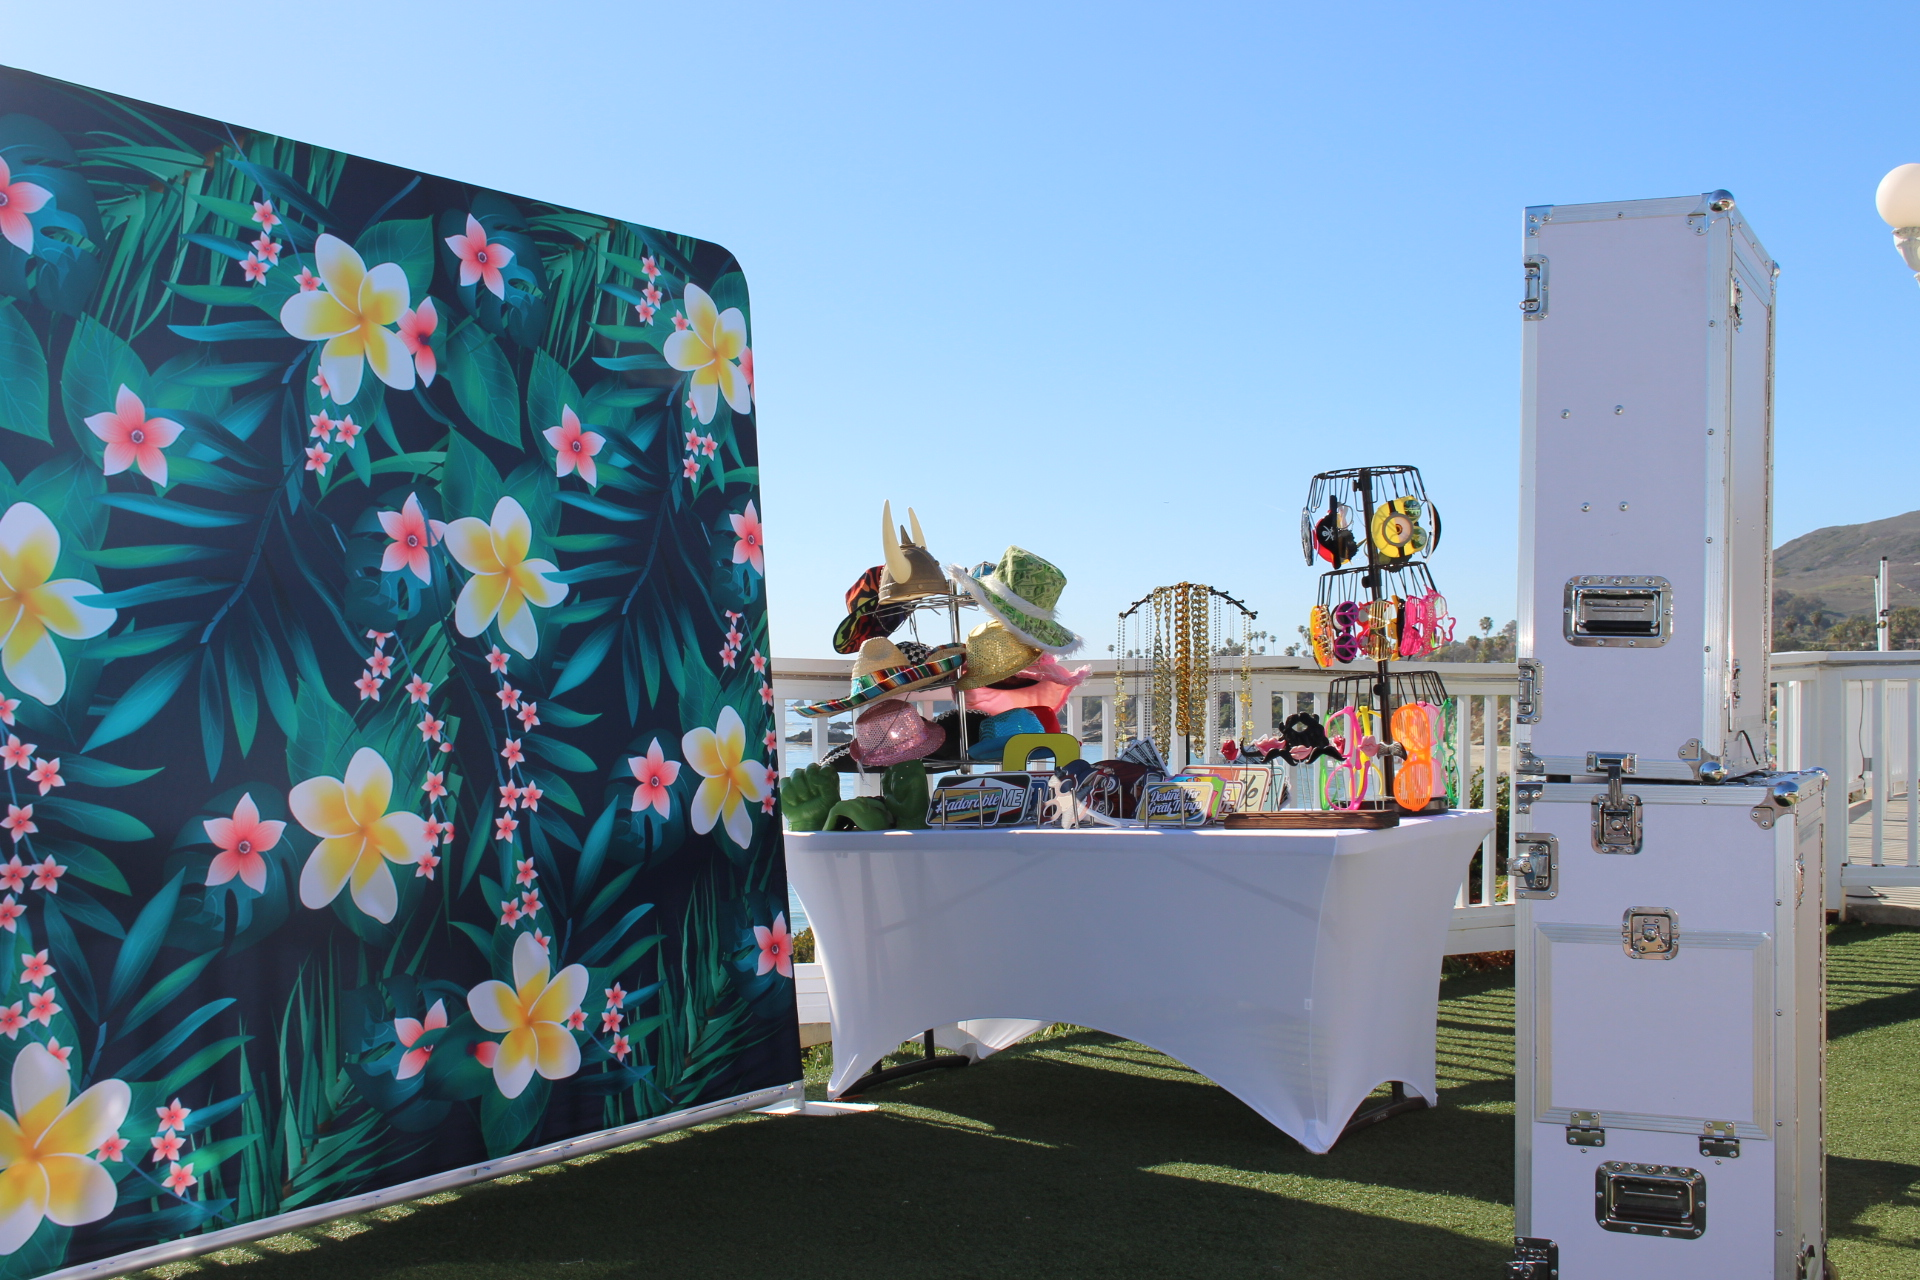 Tention Backdrop - Luau Floral